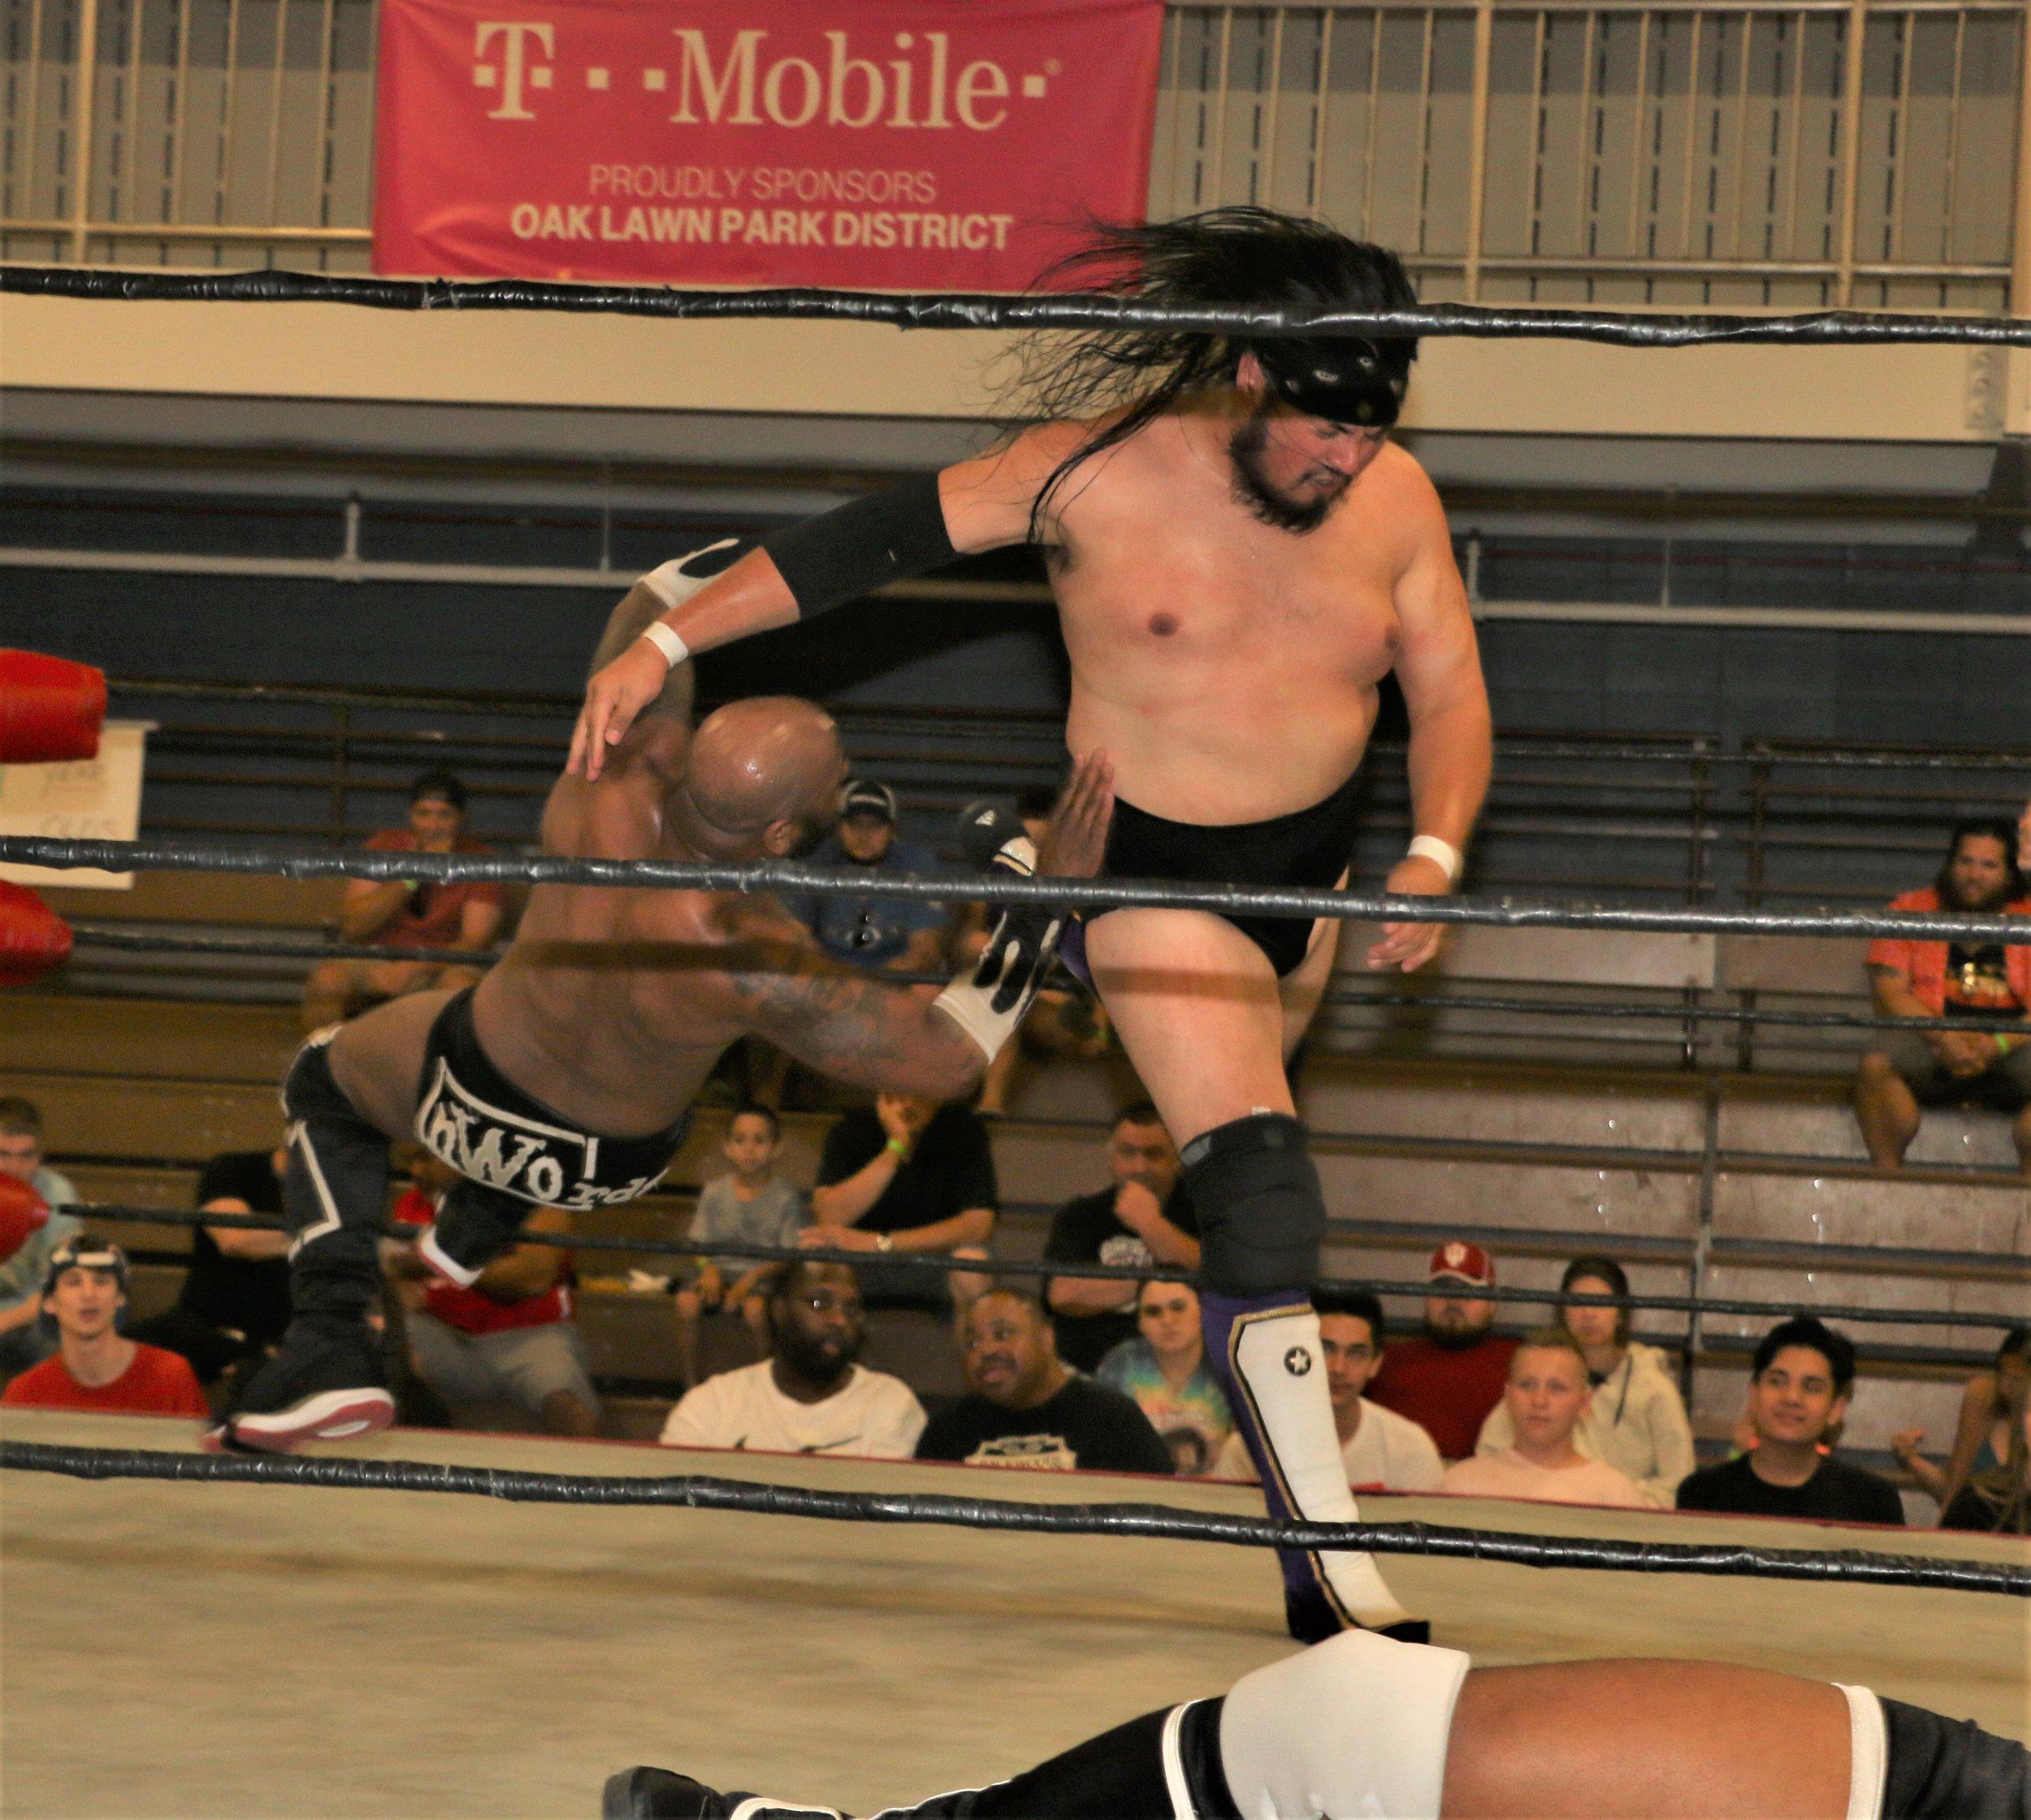 Chris Castro clotheslines Acid Jaz during the tag-team match.